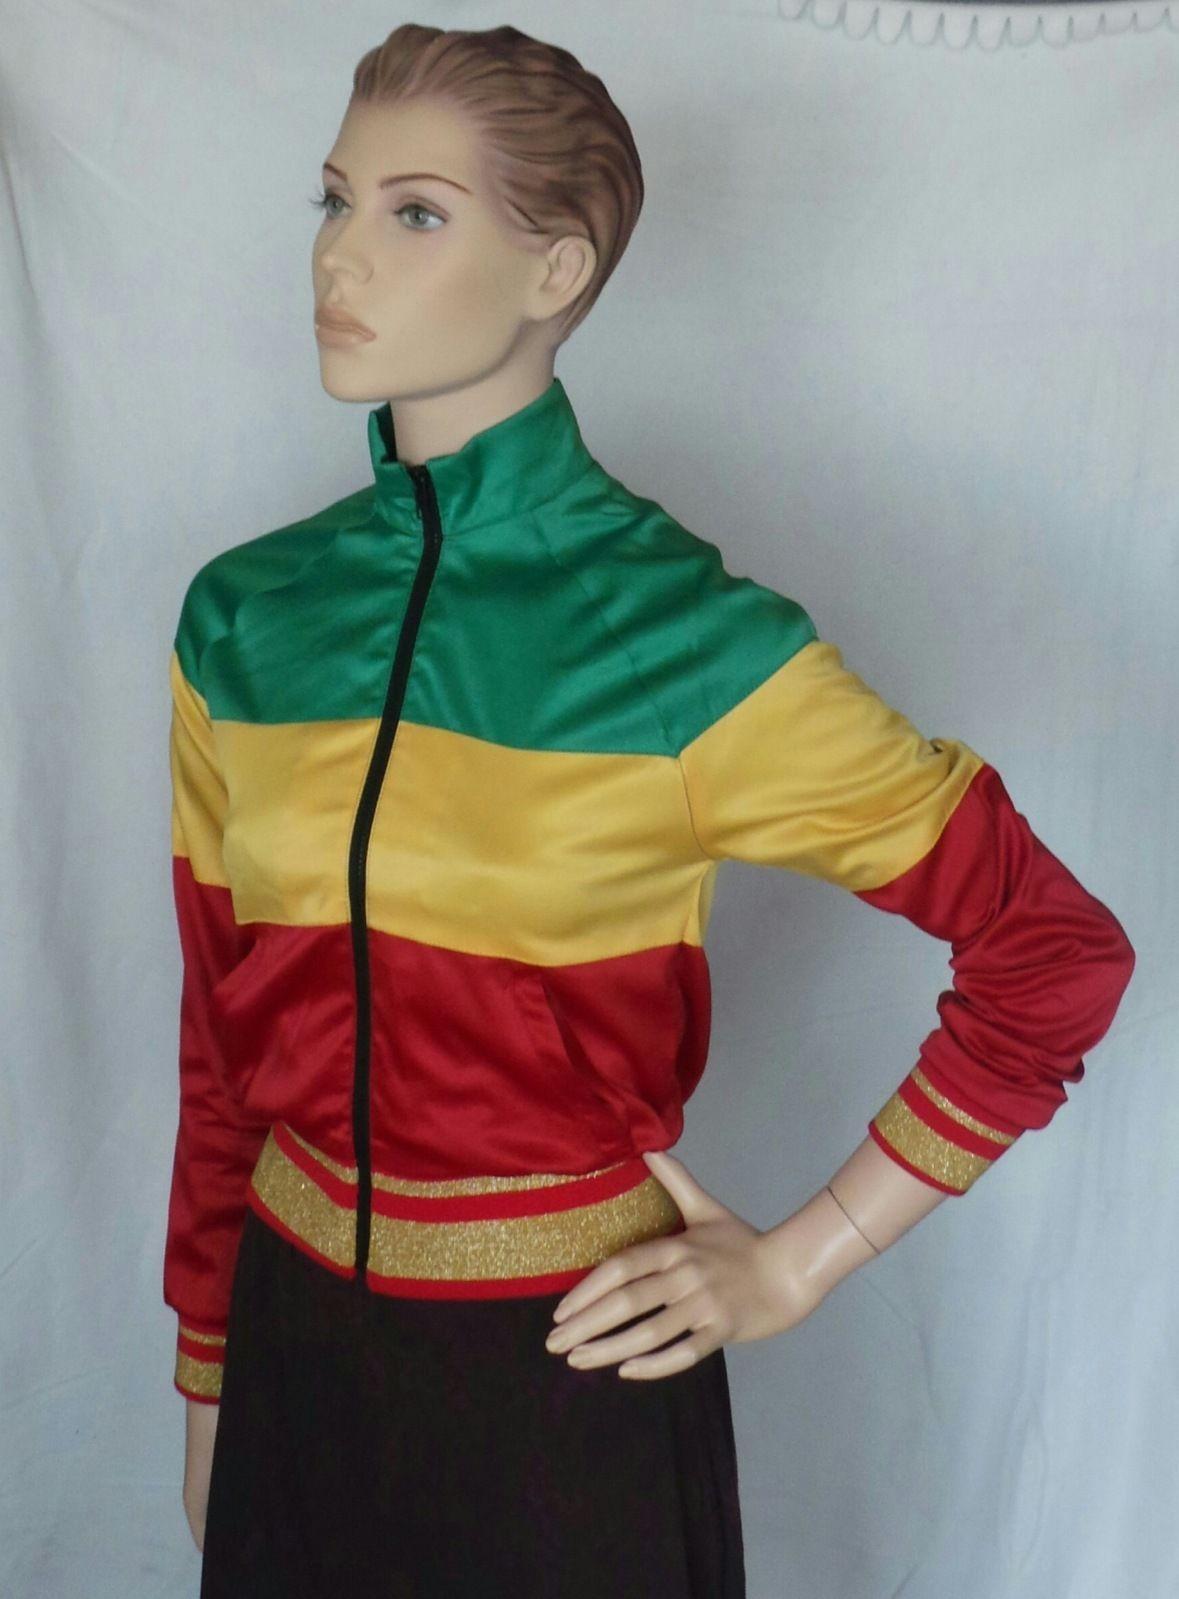 d191ed5e924 Bob Marley Tuff Gong Rasta Womens Jacket Catch A Fire Size